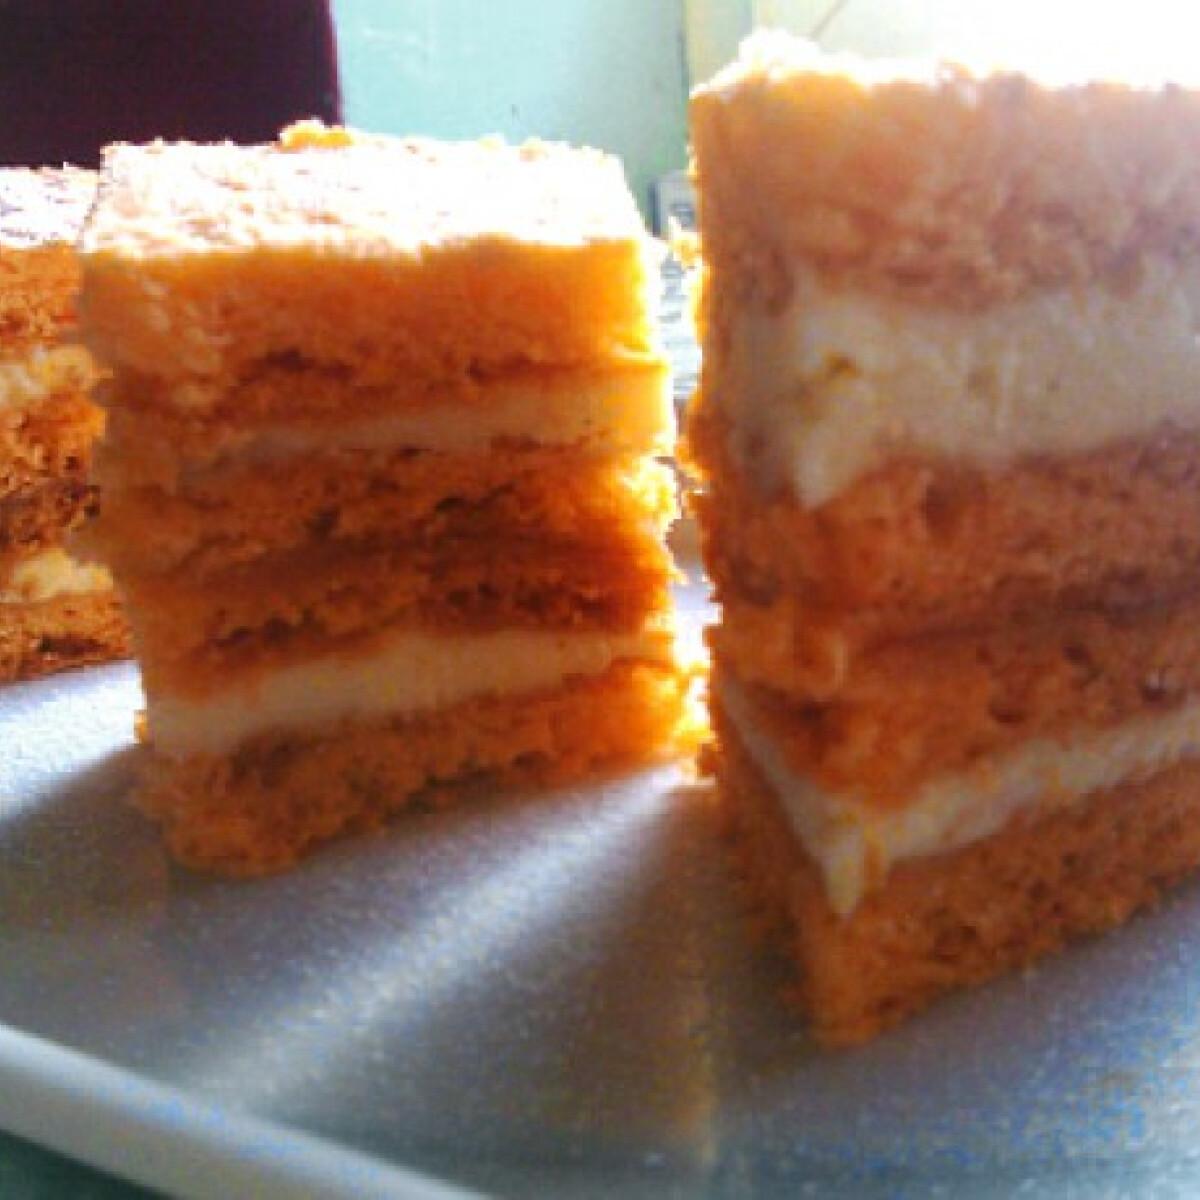 Paradicsomos sütemény Milumanotól